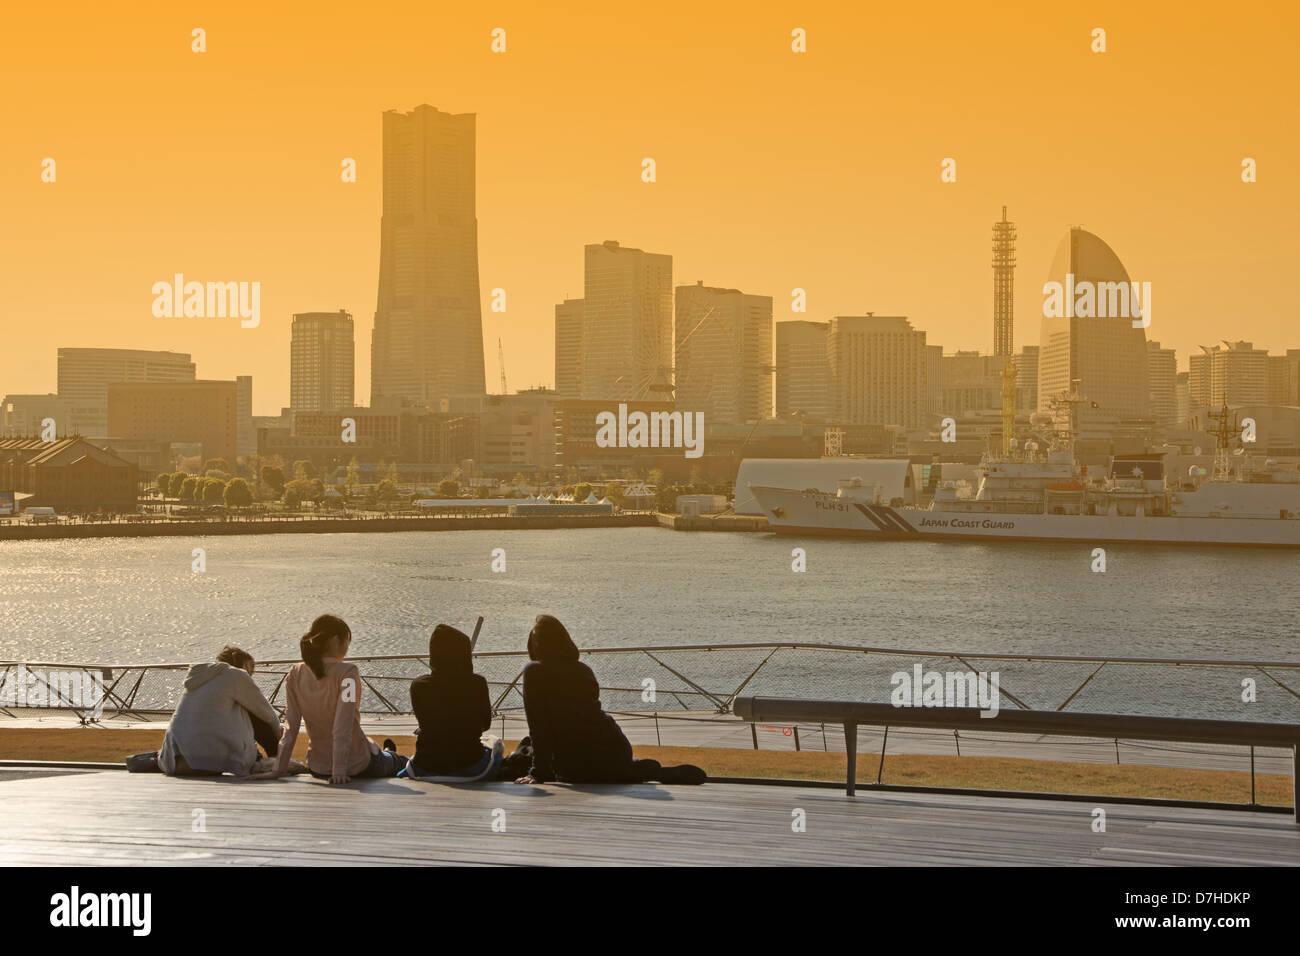 Japan, Kanagawa Prefecture, Yokohama - Stock Image